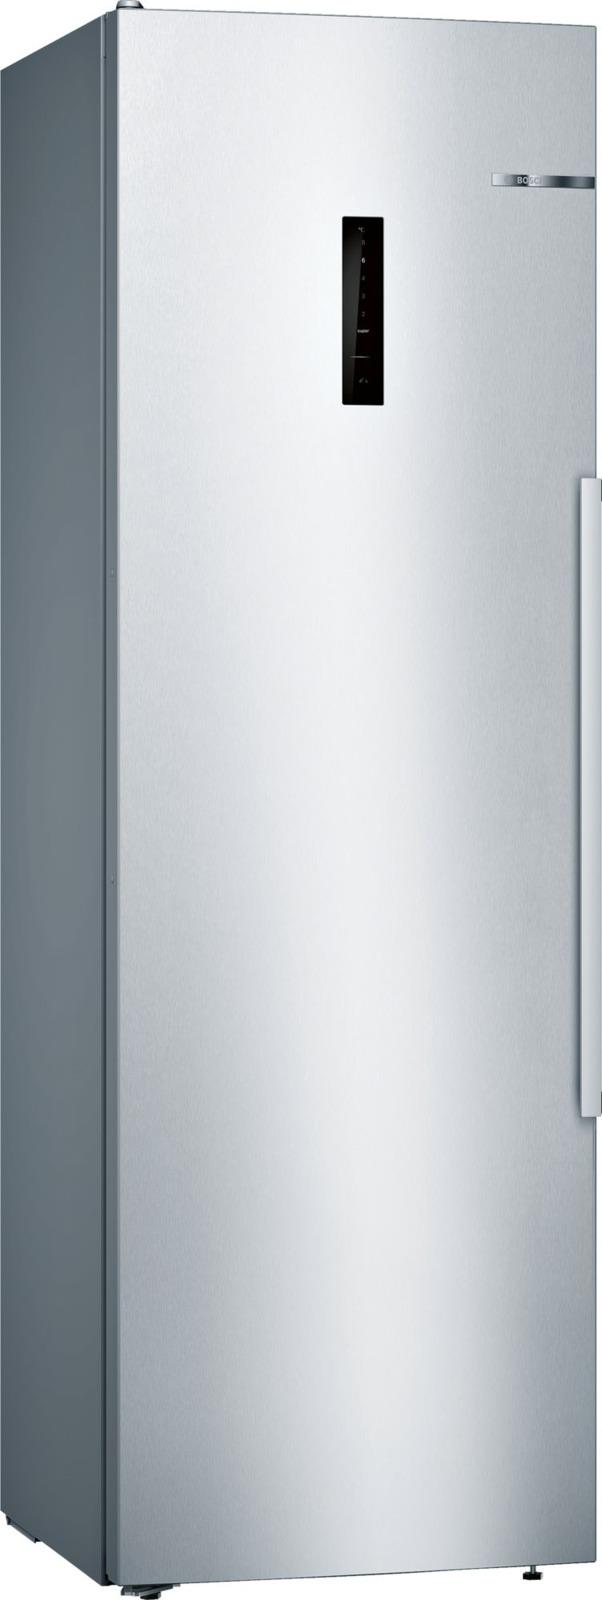 Холодильник Bosch KSV36VL21R, серебристый цена